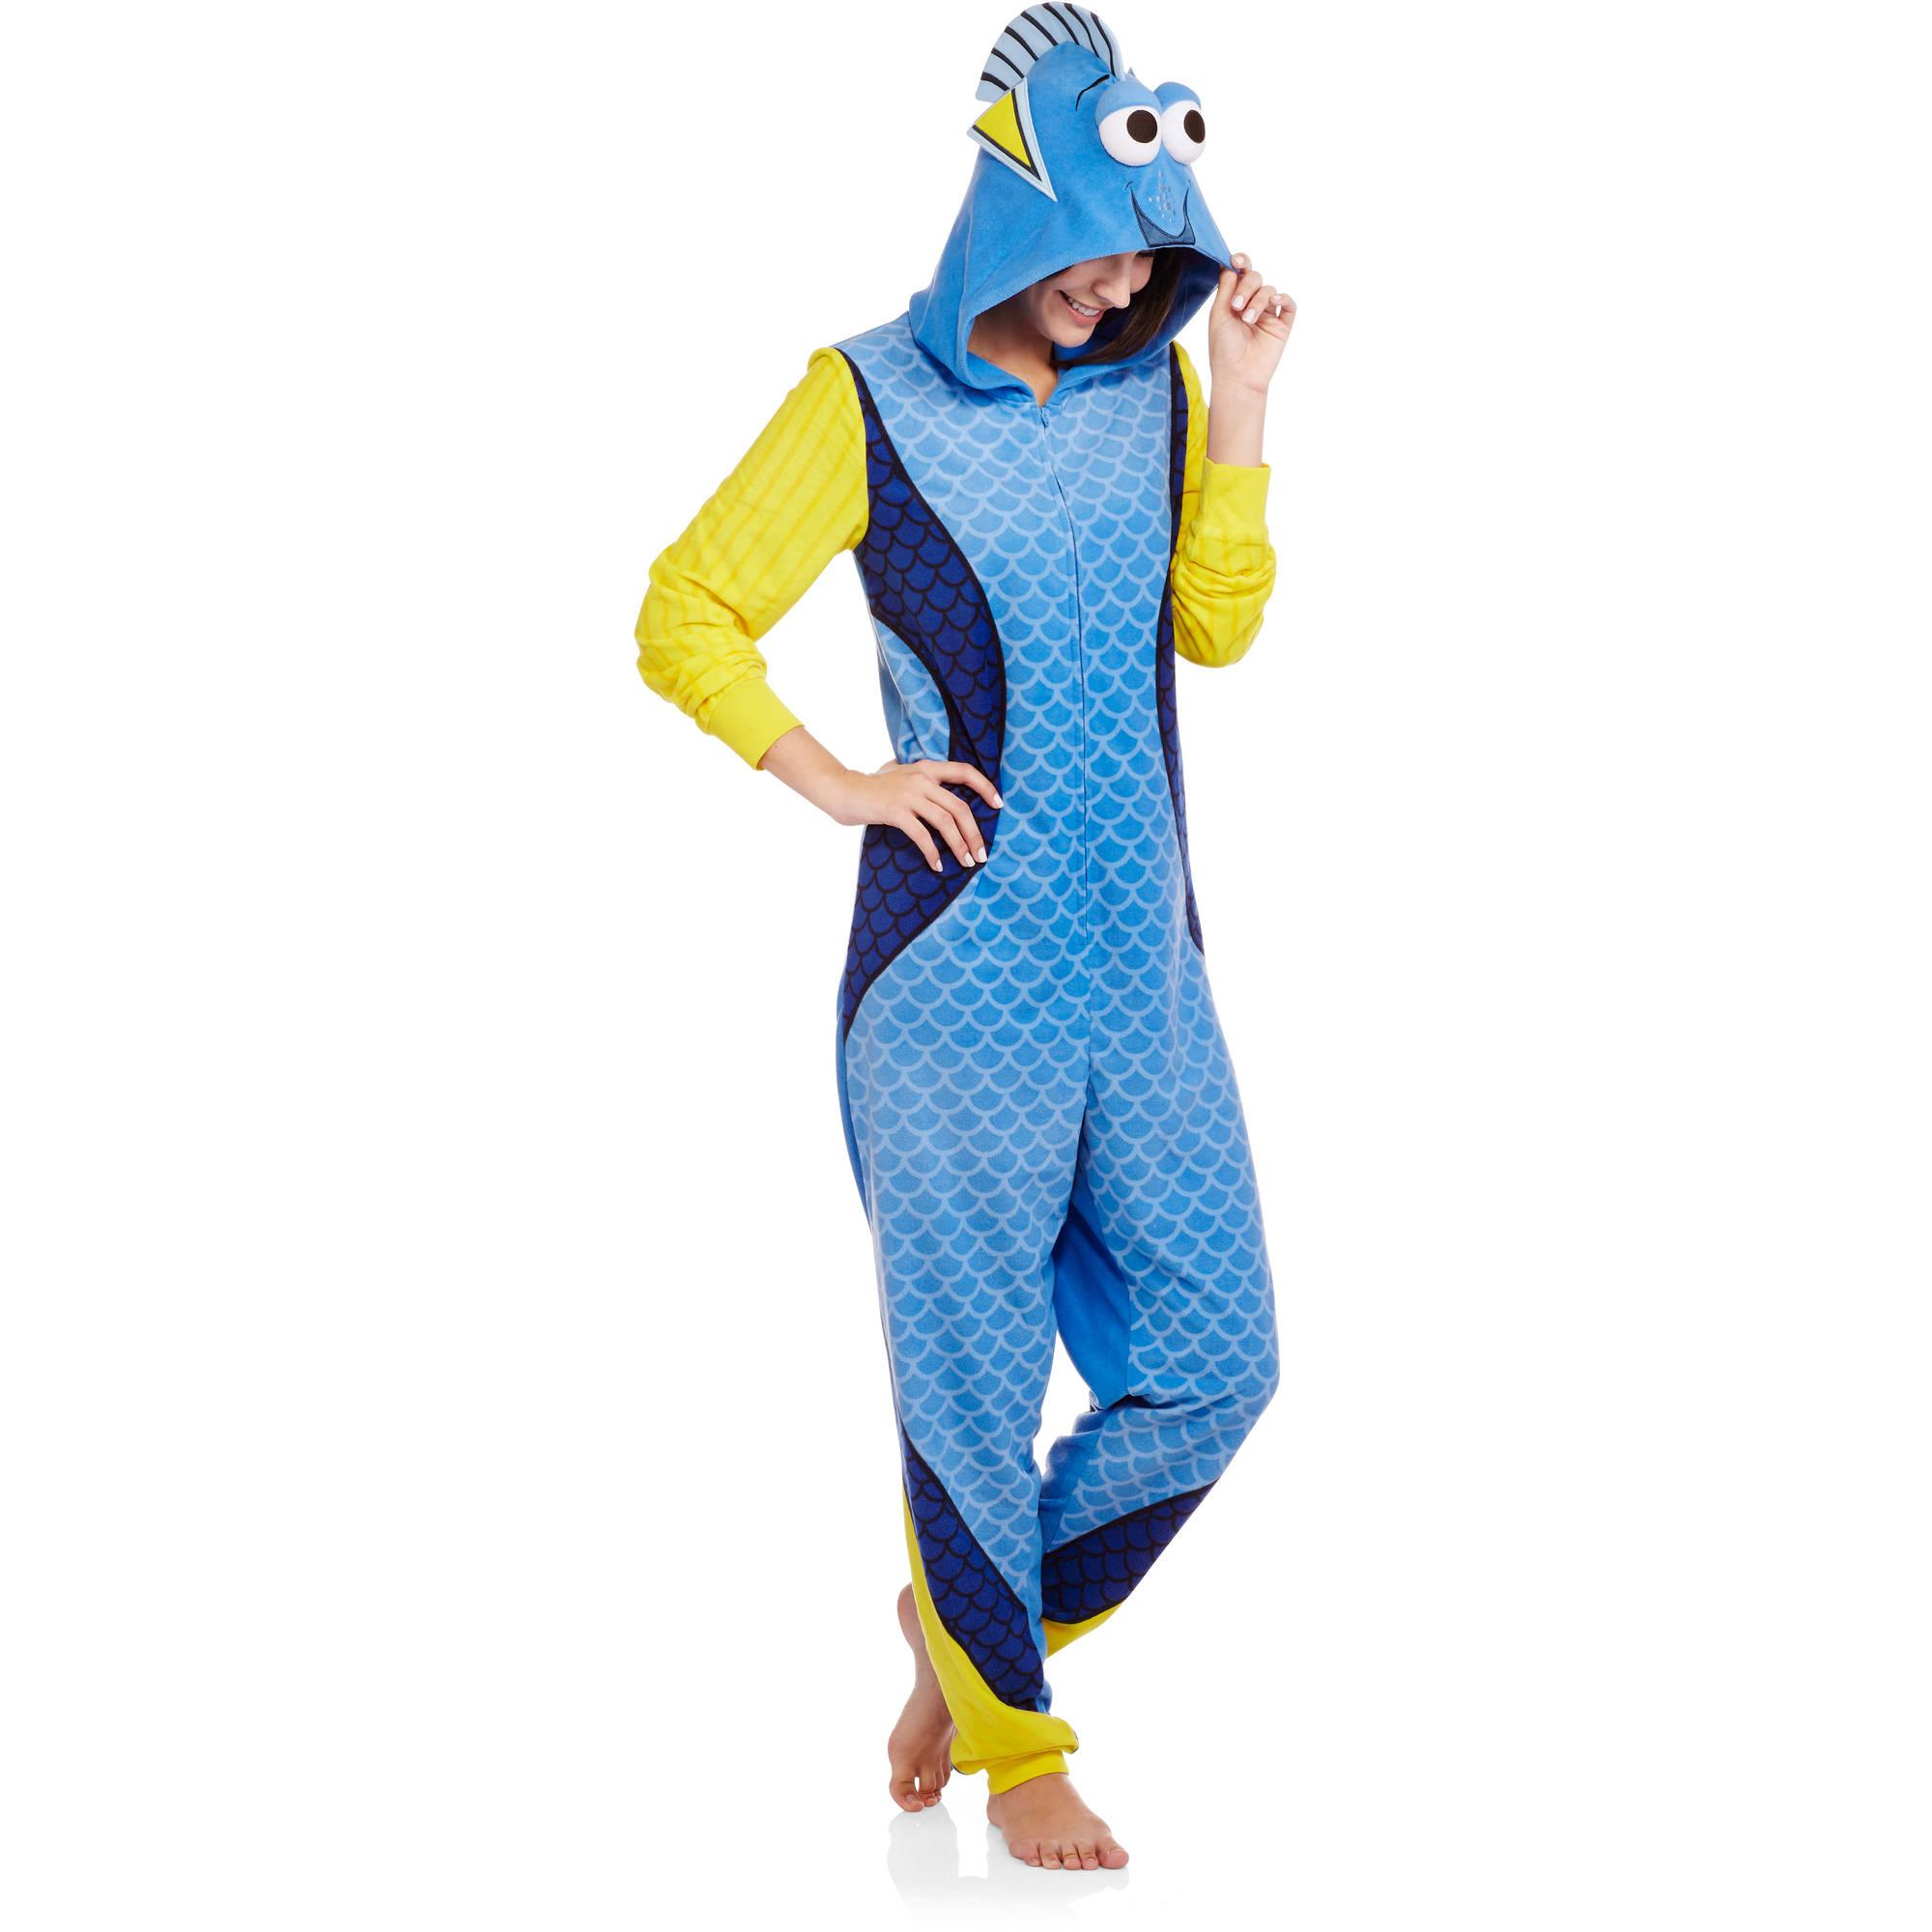 Disney Finding Dory Women's and Women's Plus License Sleepwear Adult Onesie Costume Union Suit Pajama (XS-3X)